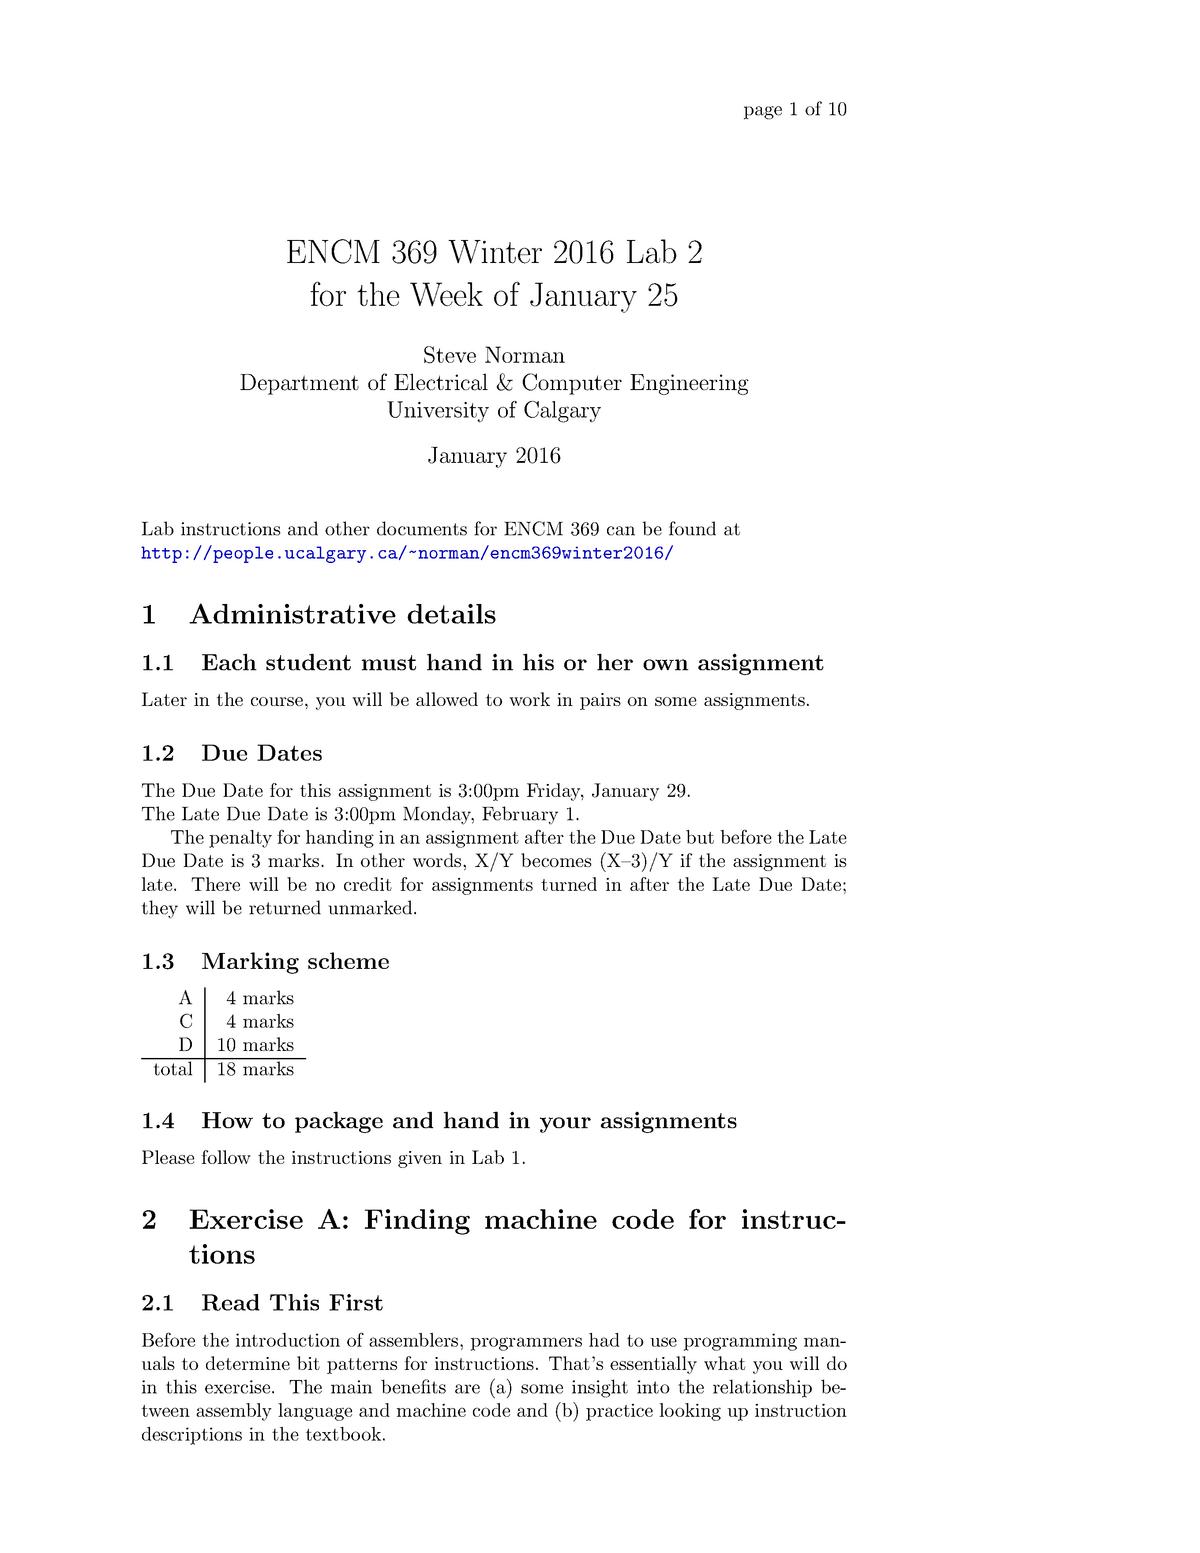 Seminar Assignments - Lab 2 - ENCM 369: Computer Organization - StuDocu